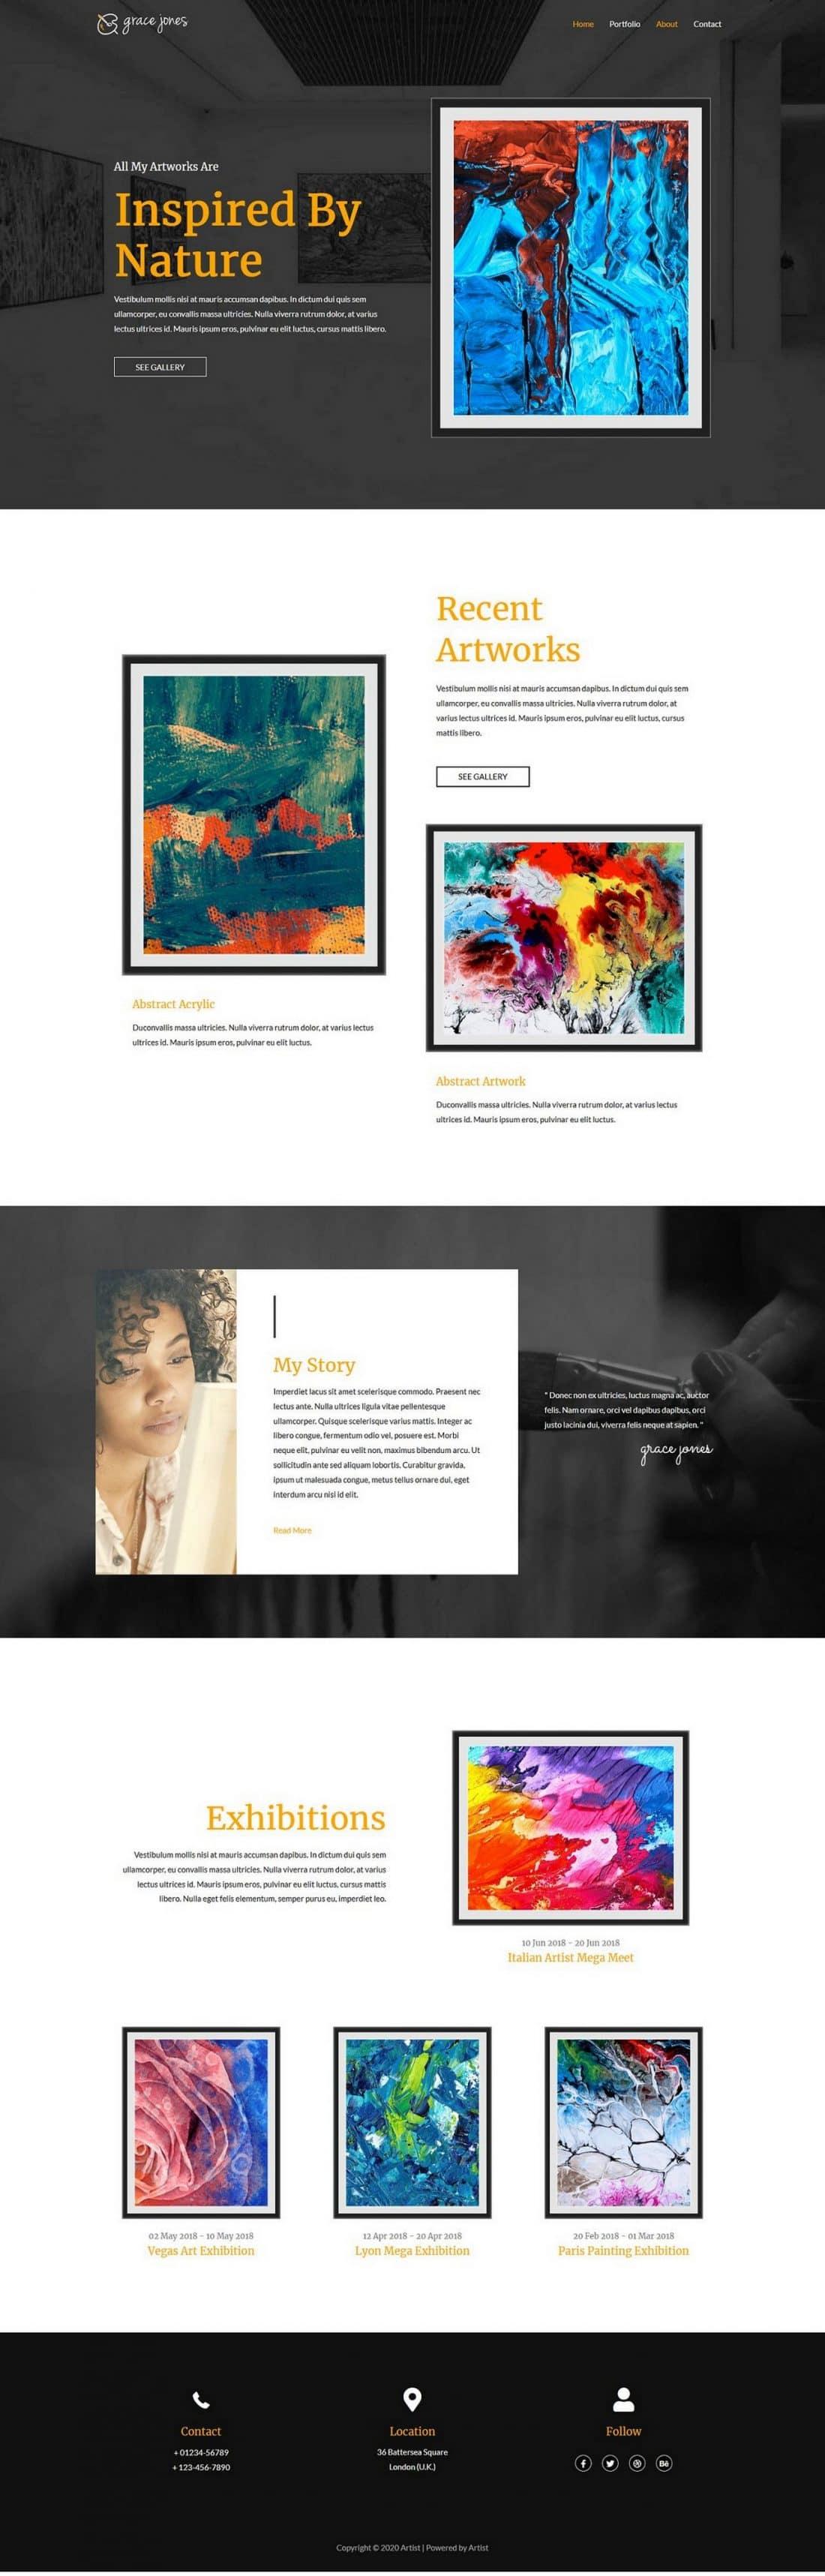 Fagowi.com Website Design Templates For Artist A - Home Page Image